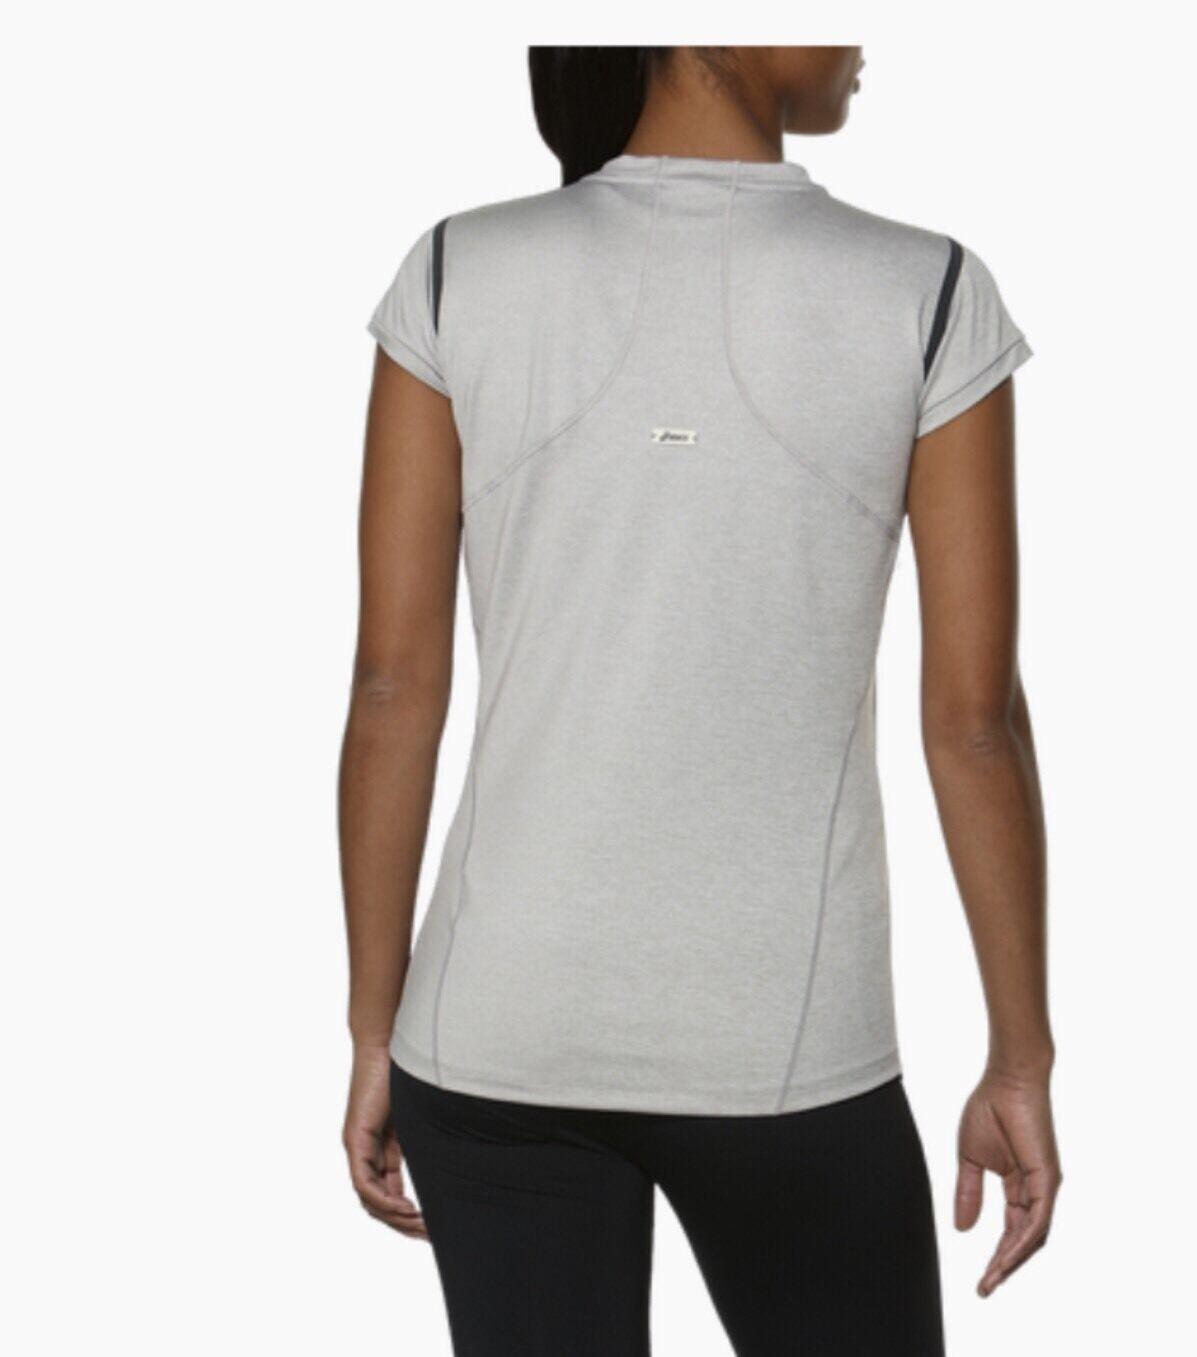 Asics Damen Laufen Spezial Performance Bequem T-Shirt Hellgrau GRÖSSE S